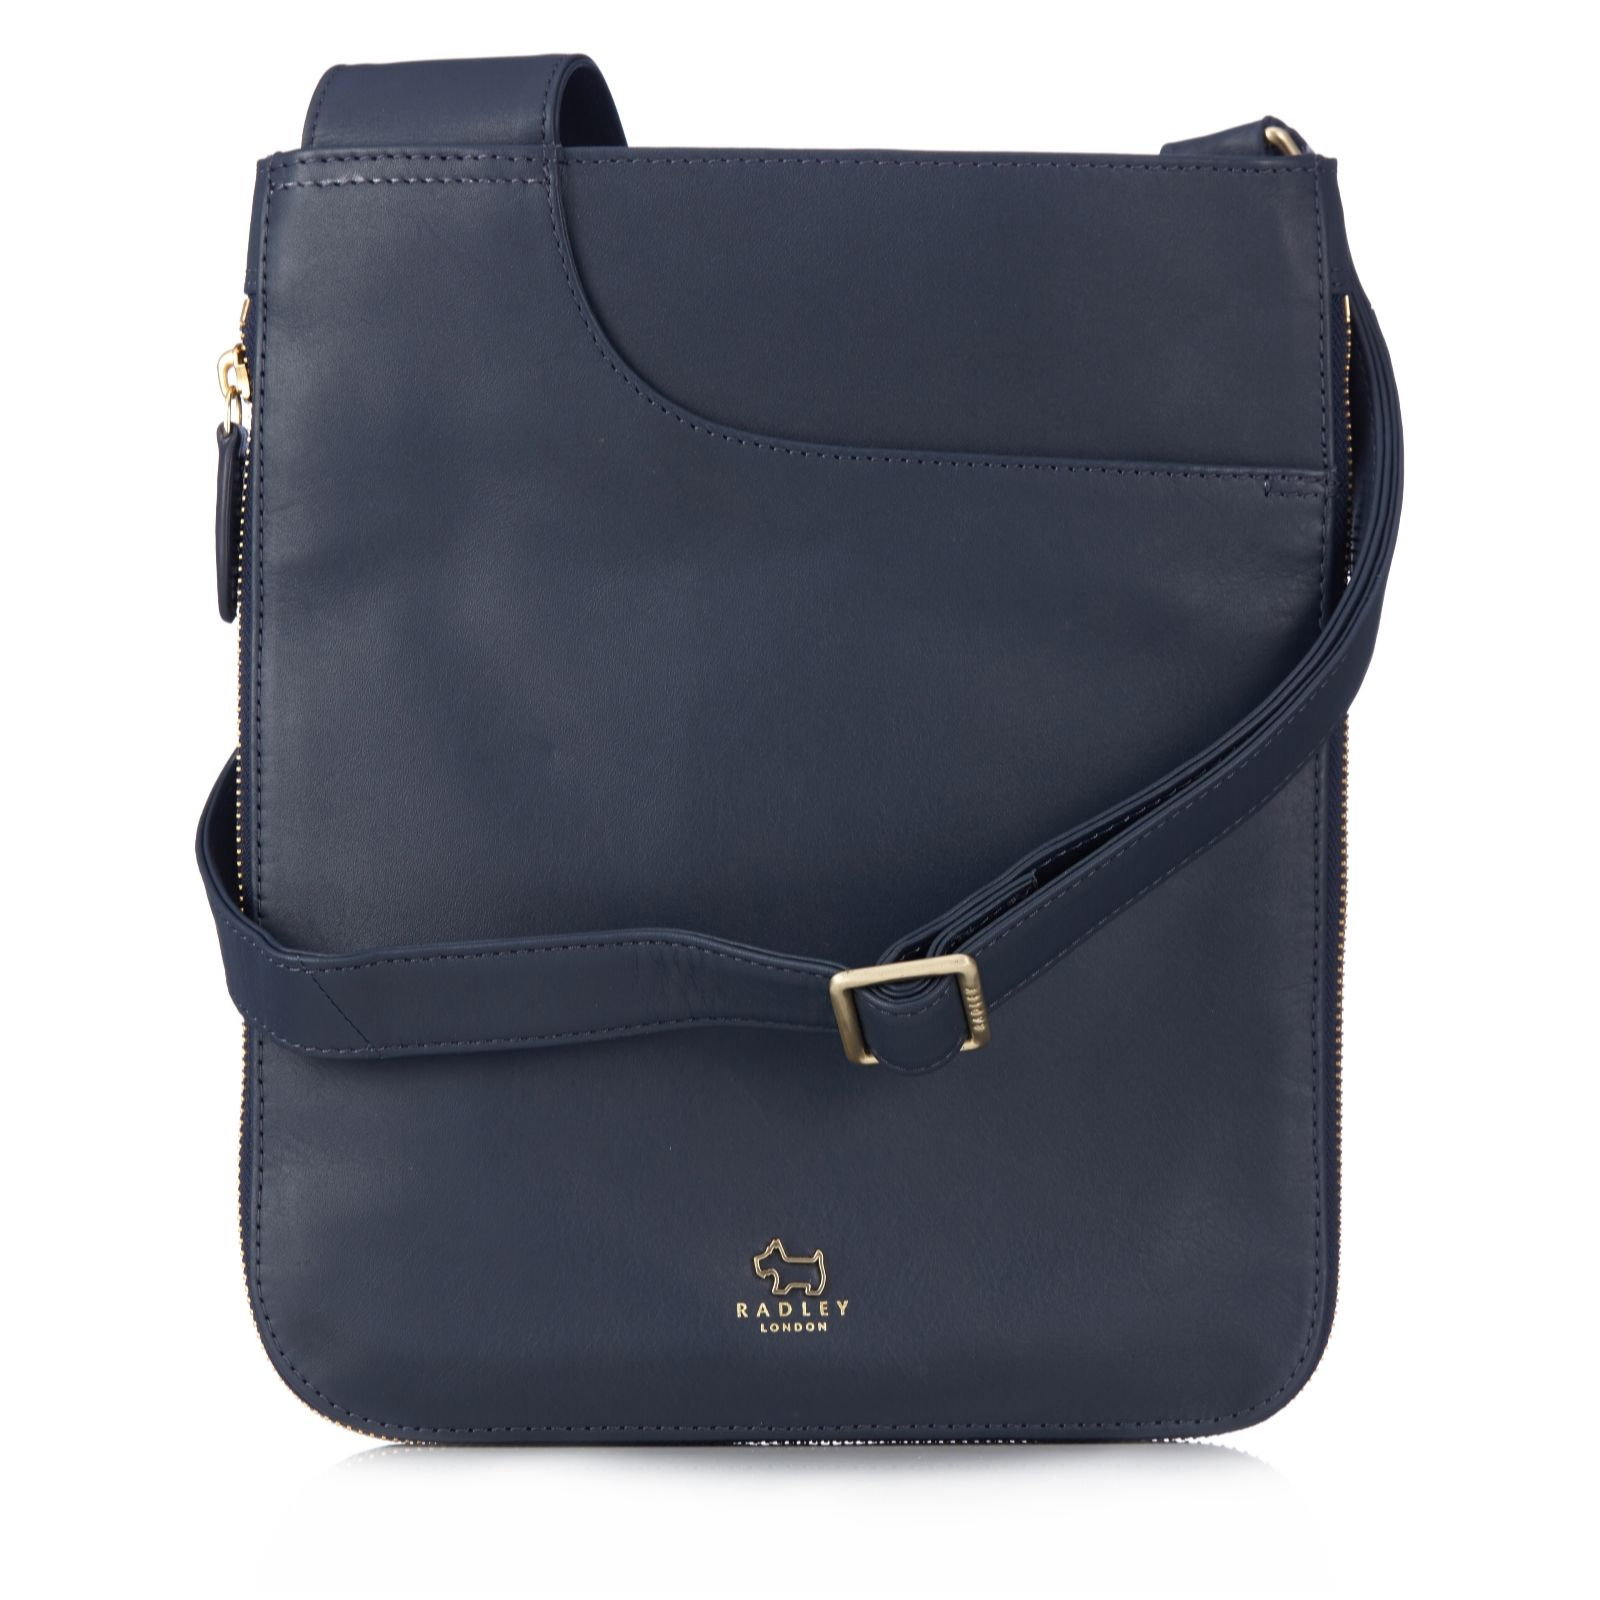 Radley London Pockets Medium Leather Zip Top Crossbody Bag - QVC UK 8e03675f314d1